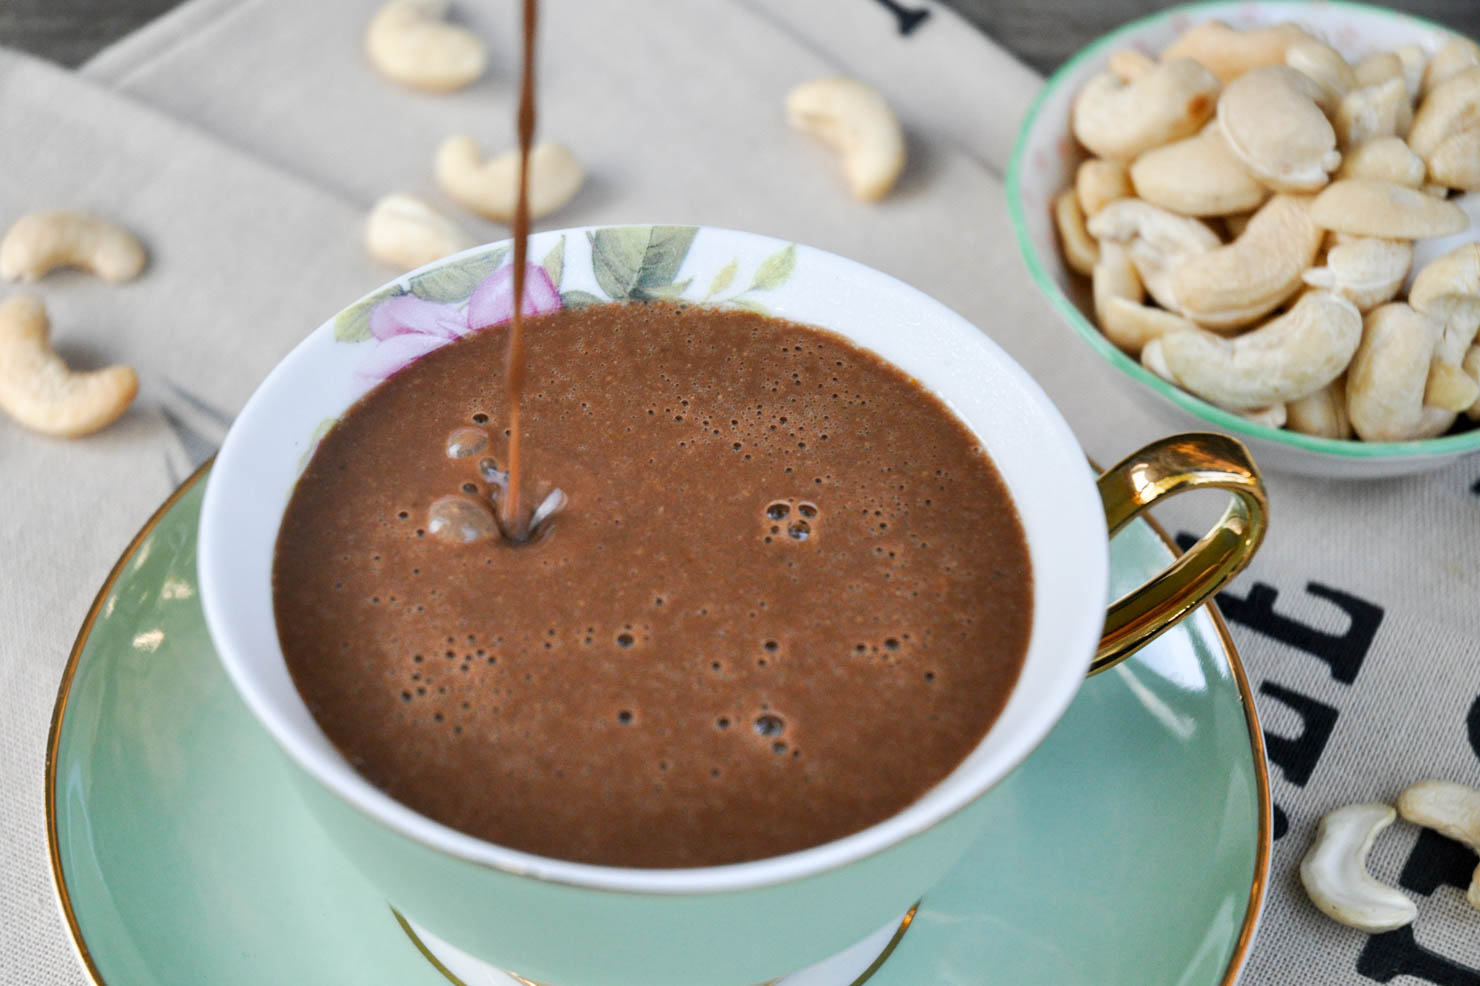 kakao-med-cashewnotter-og-urter-3